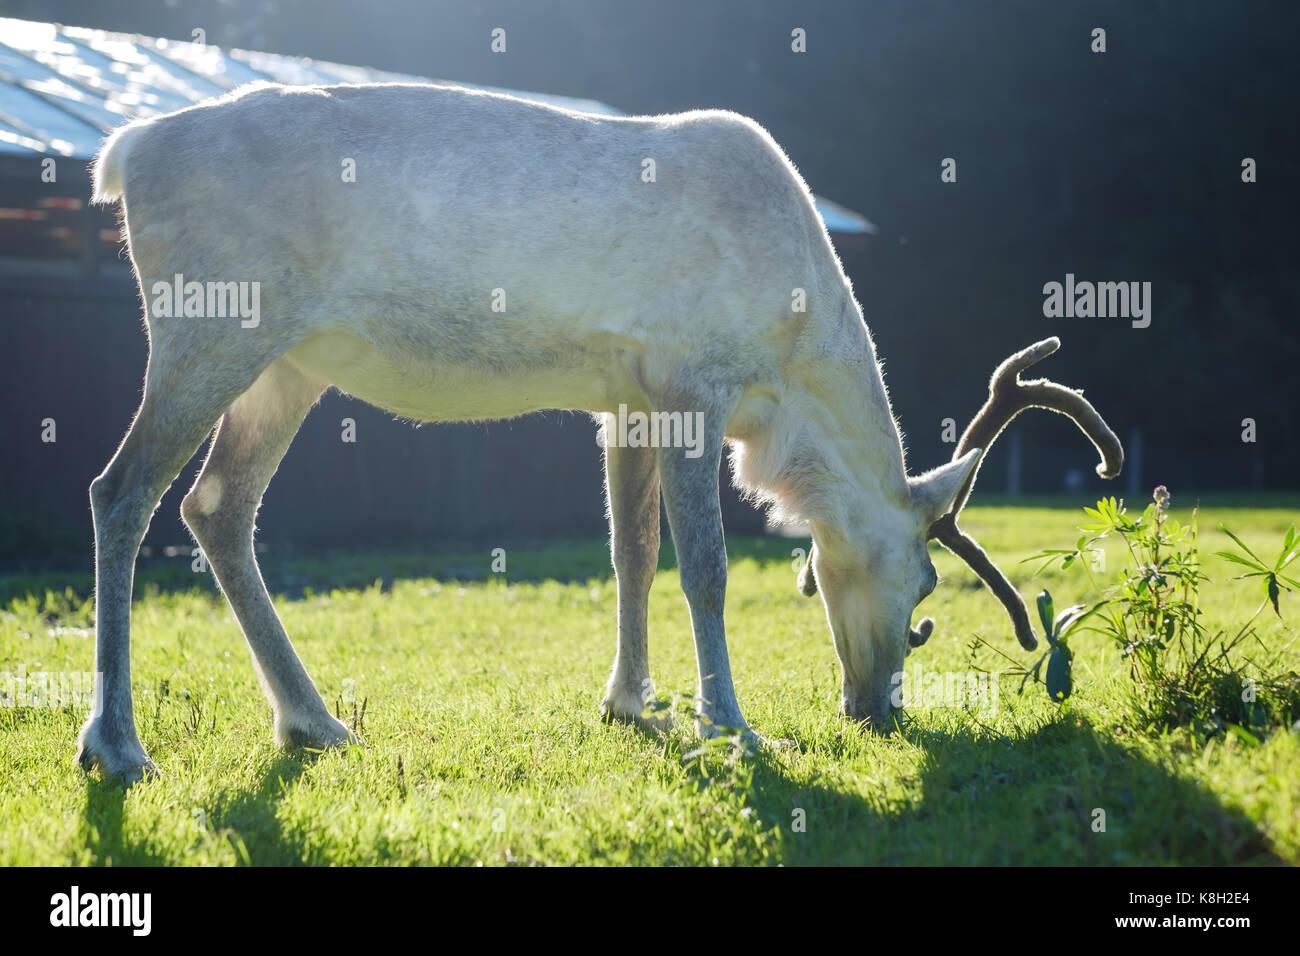 White female reindeer in eco farm. - Stock Image